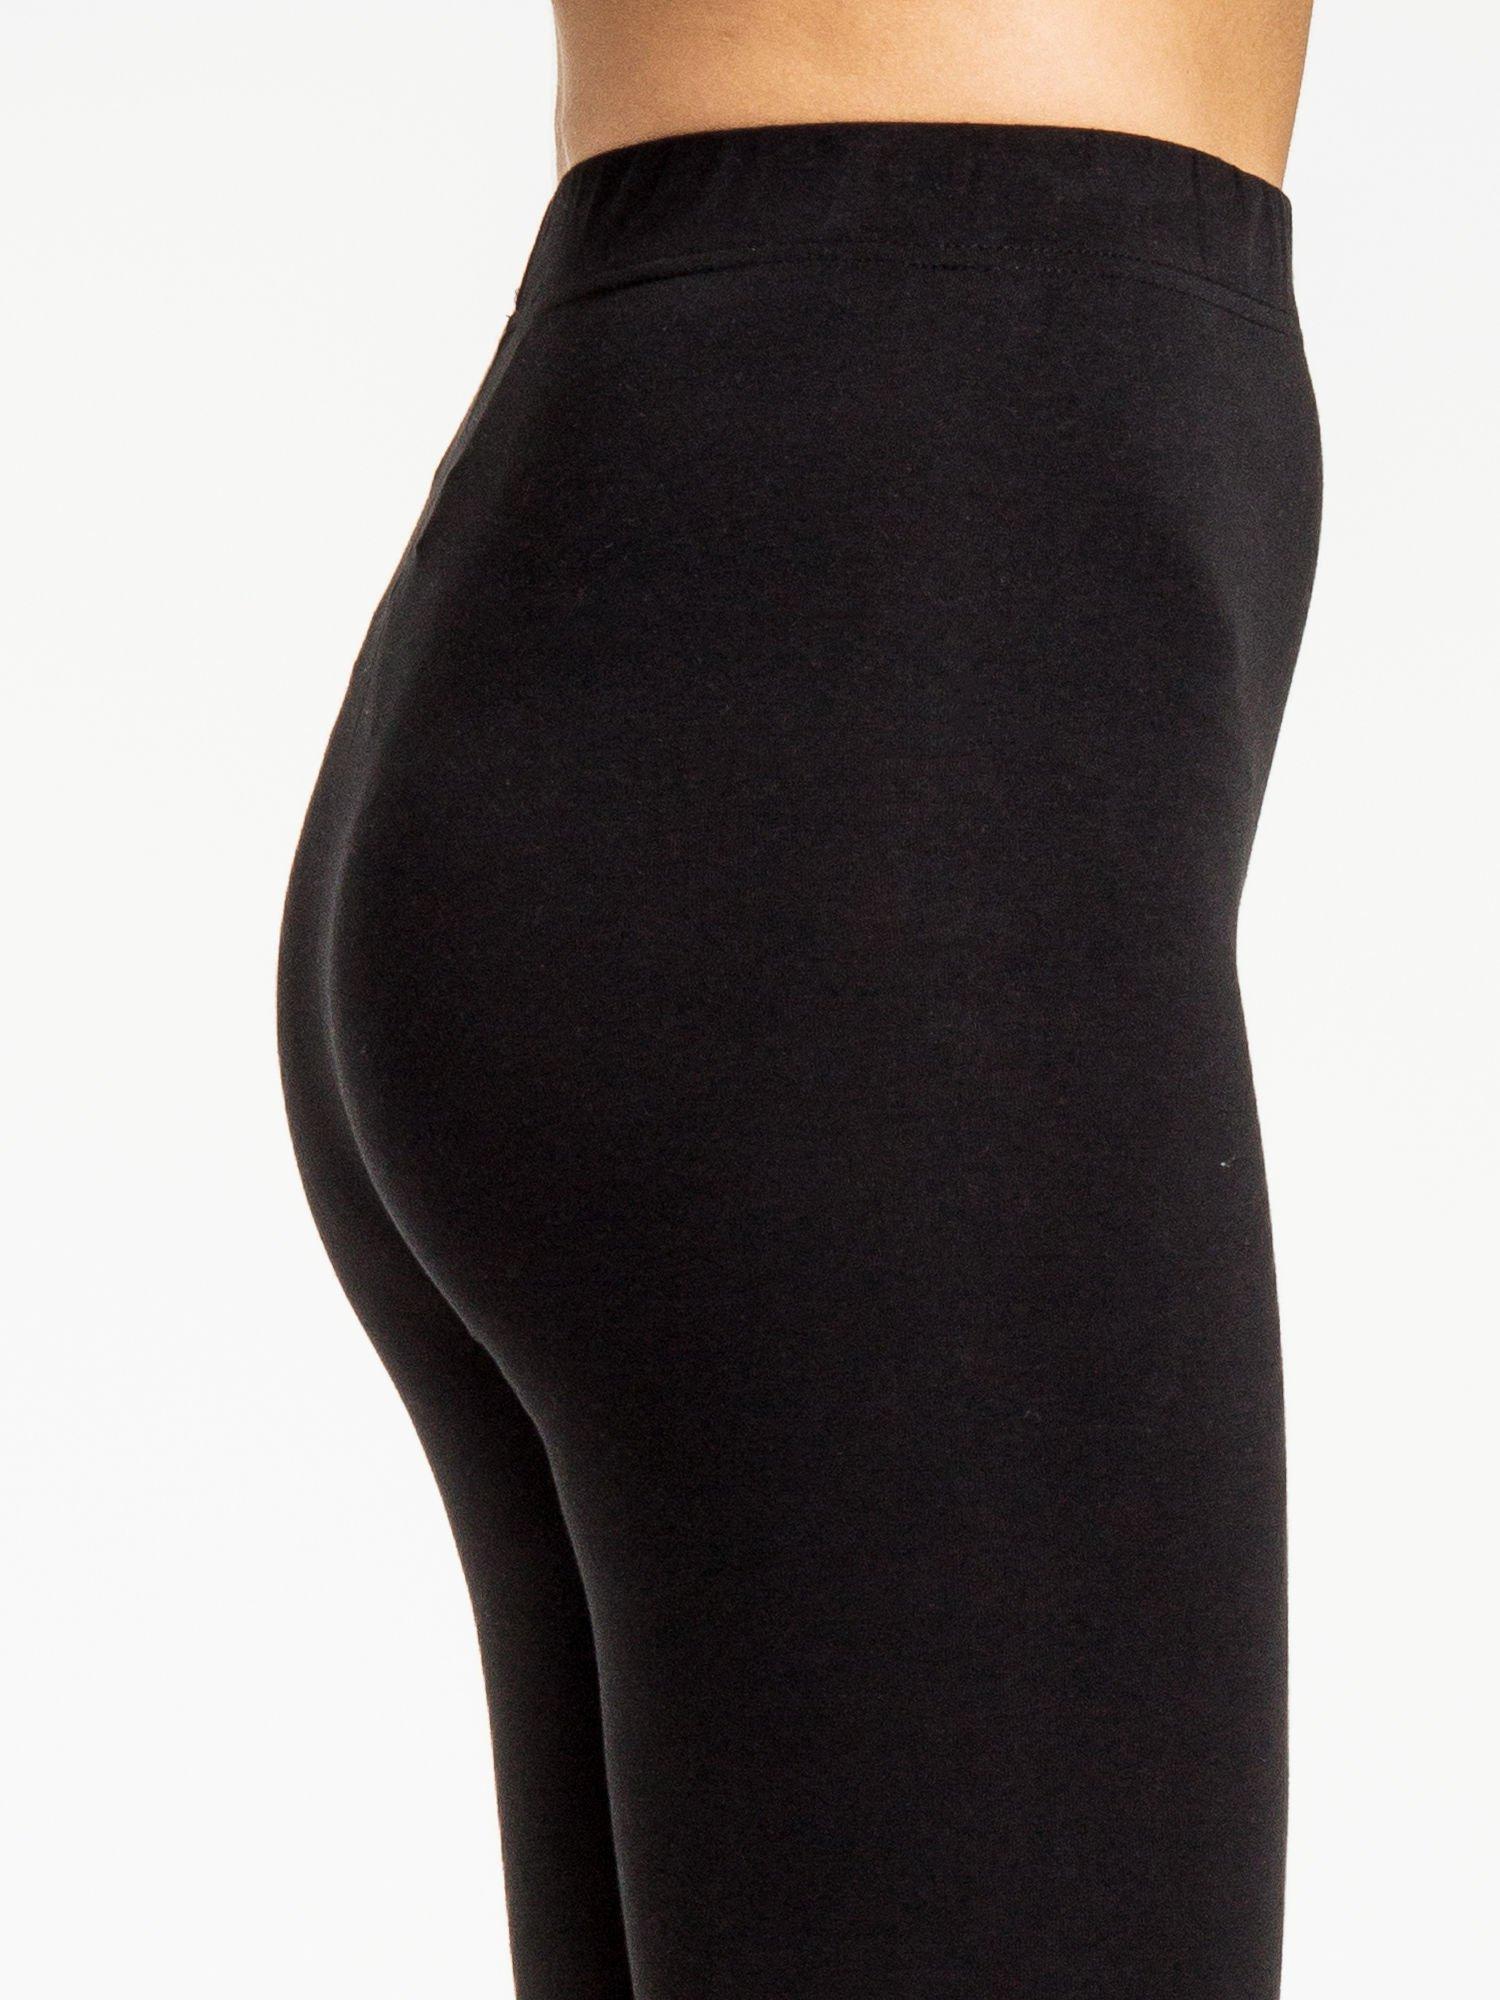 Czarne legginsy z dżetami na dole                                  zdj.                                  6